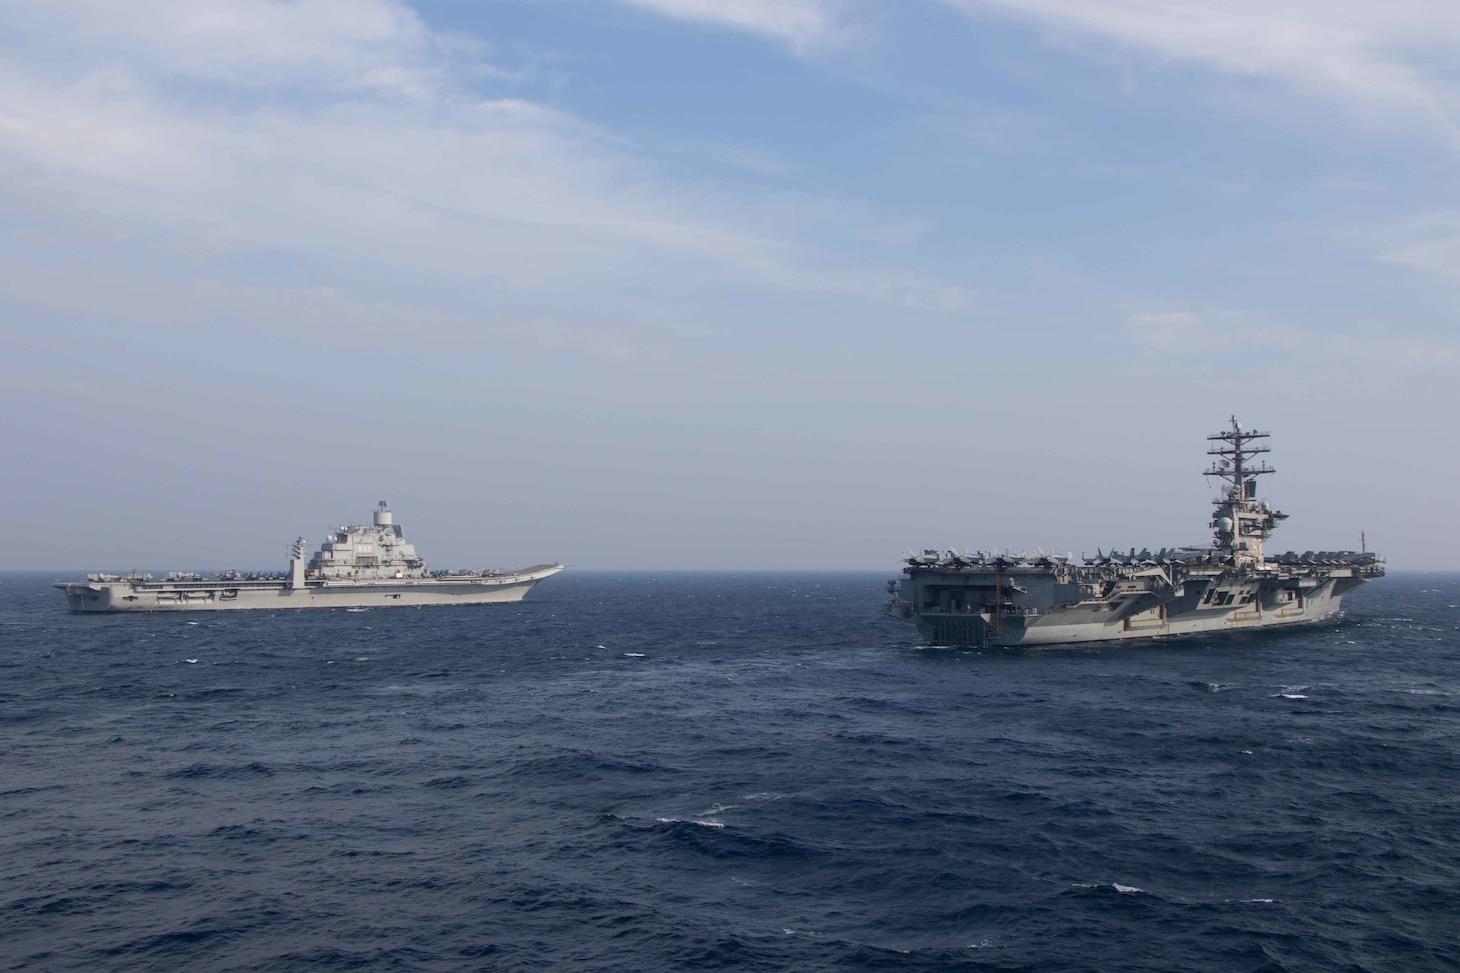 USS Nimitz (CVN 68) steams alongside the Indian navy aircraft carrier INS Vikramaditya (CV-R33) during Malabar in the North Arabian Sea.